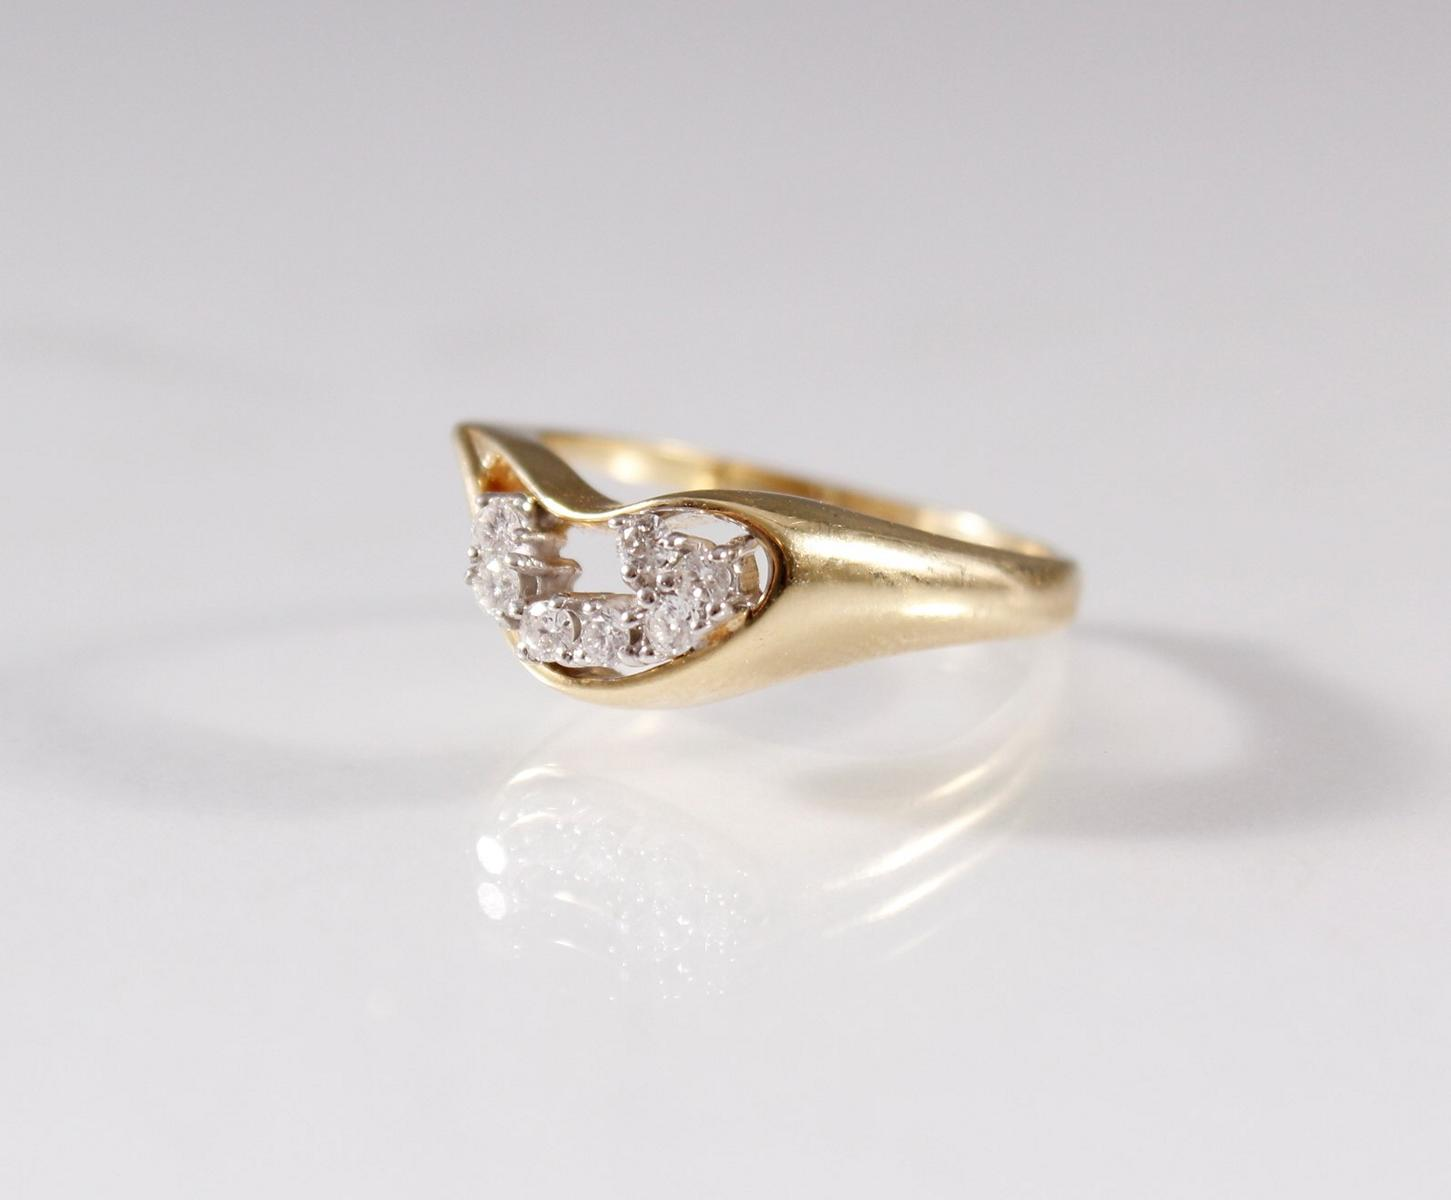 Damenring mit Diamanten , 8 Karat Gelbgold